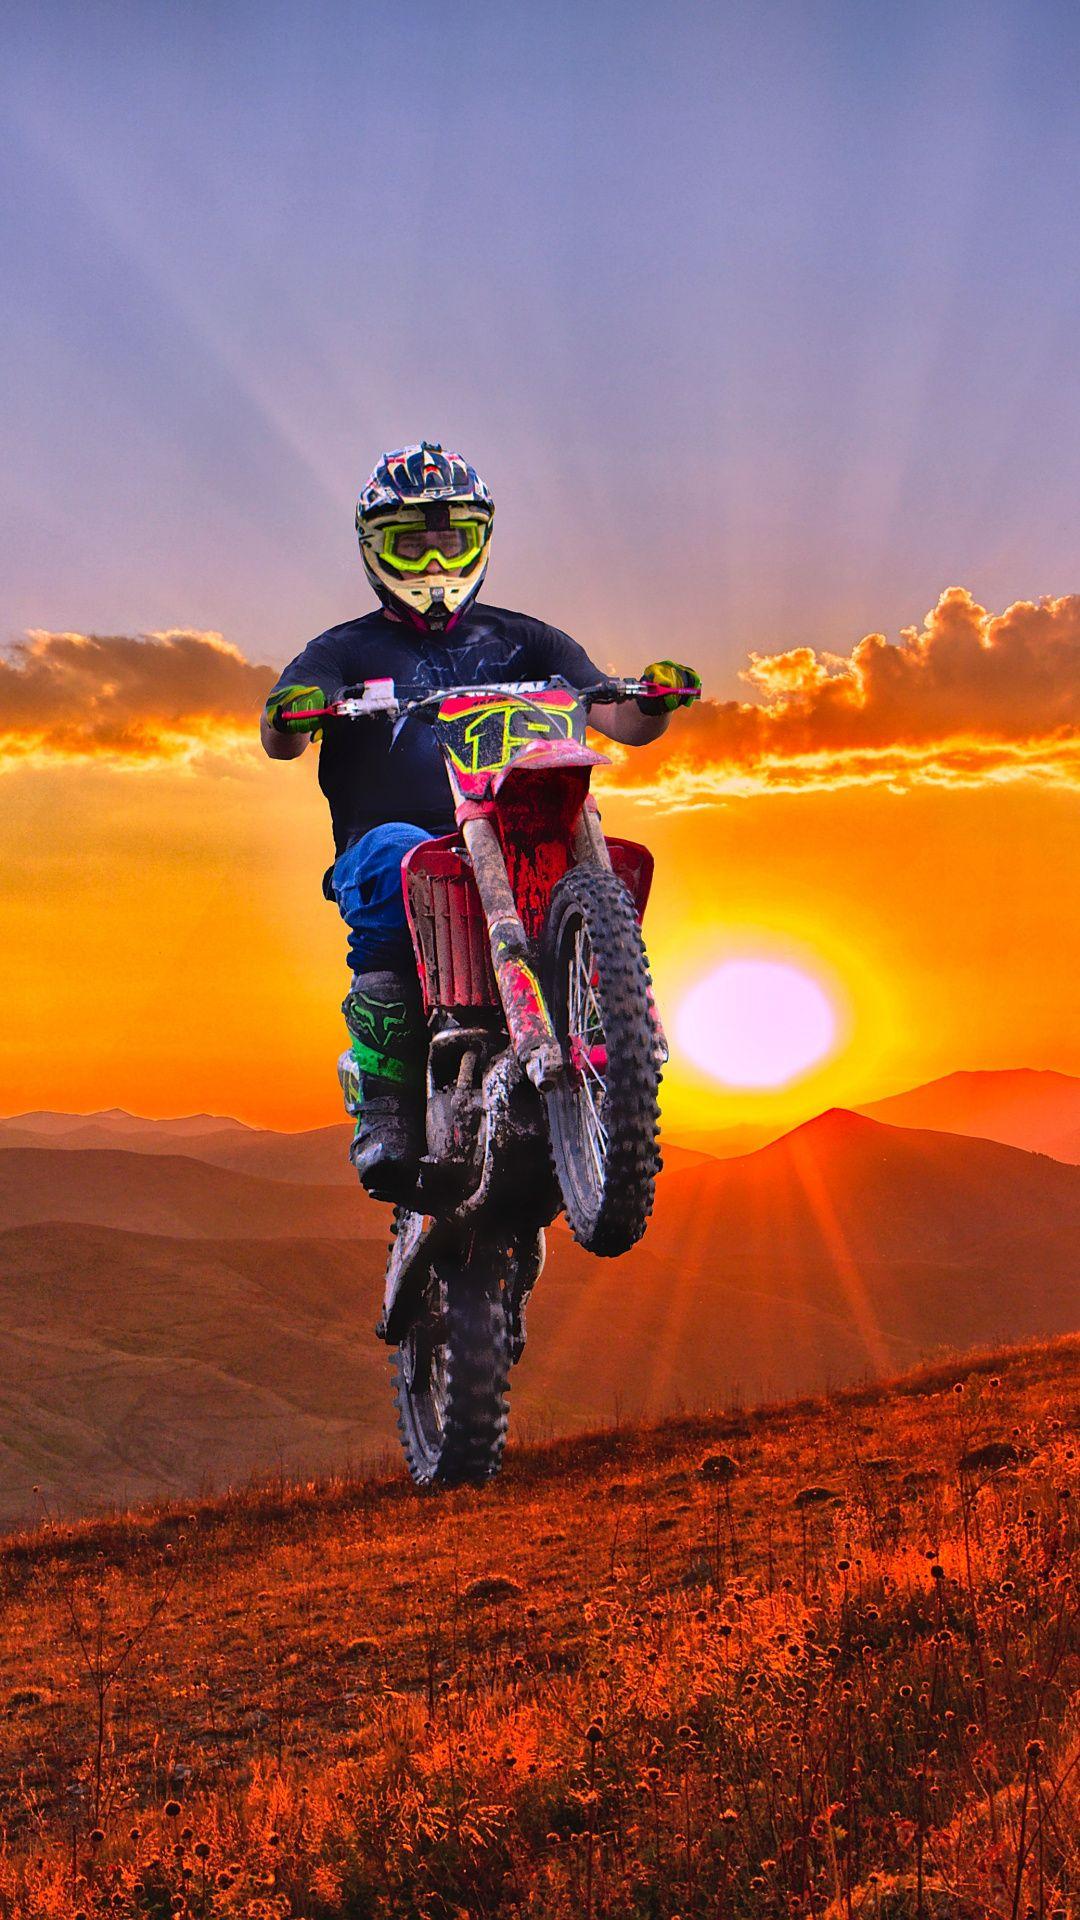 Download Wallpaper Motor Cross : download, wallpaper, motor, cross, Wallpapers, Motocross,, Enduro,, Sunset,, Bicycle,, Motorcycle, Helmets, Enduro, Motorcycle,, Yamaha, Motocross